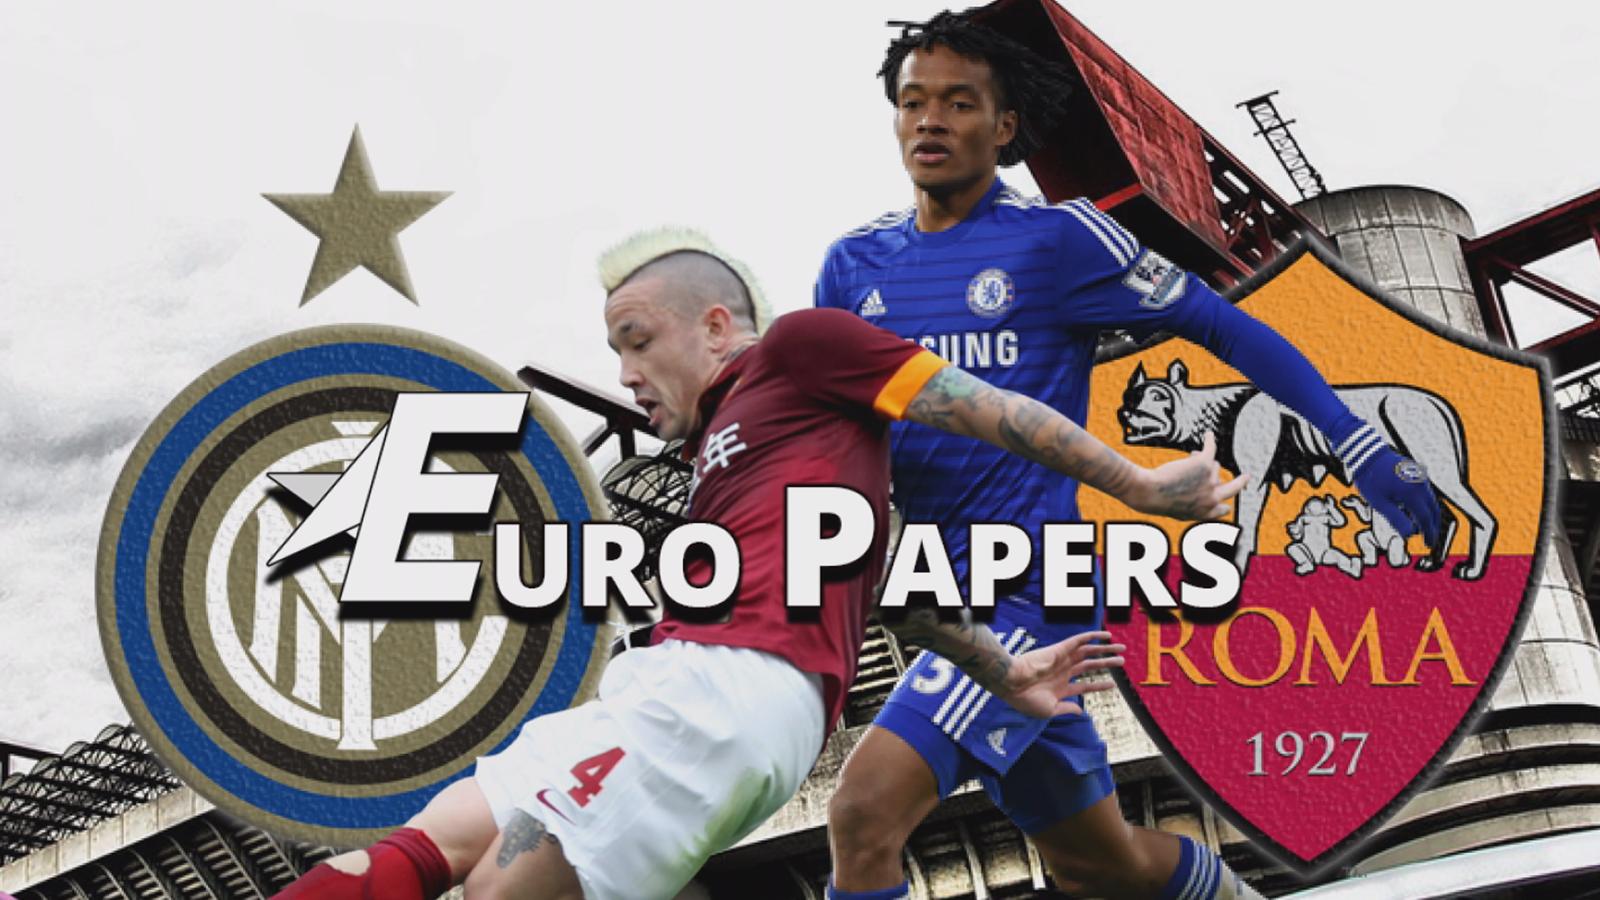 It's Roma vs Inter in a transfer scrap for both Nainggolan & Cuadrado - Euro Papers